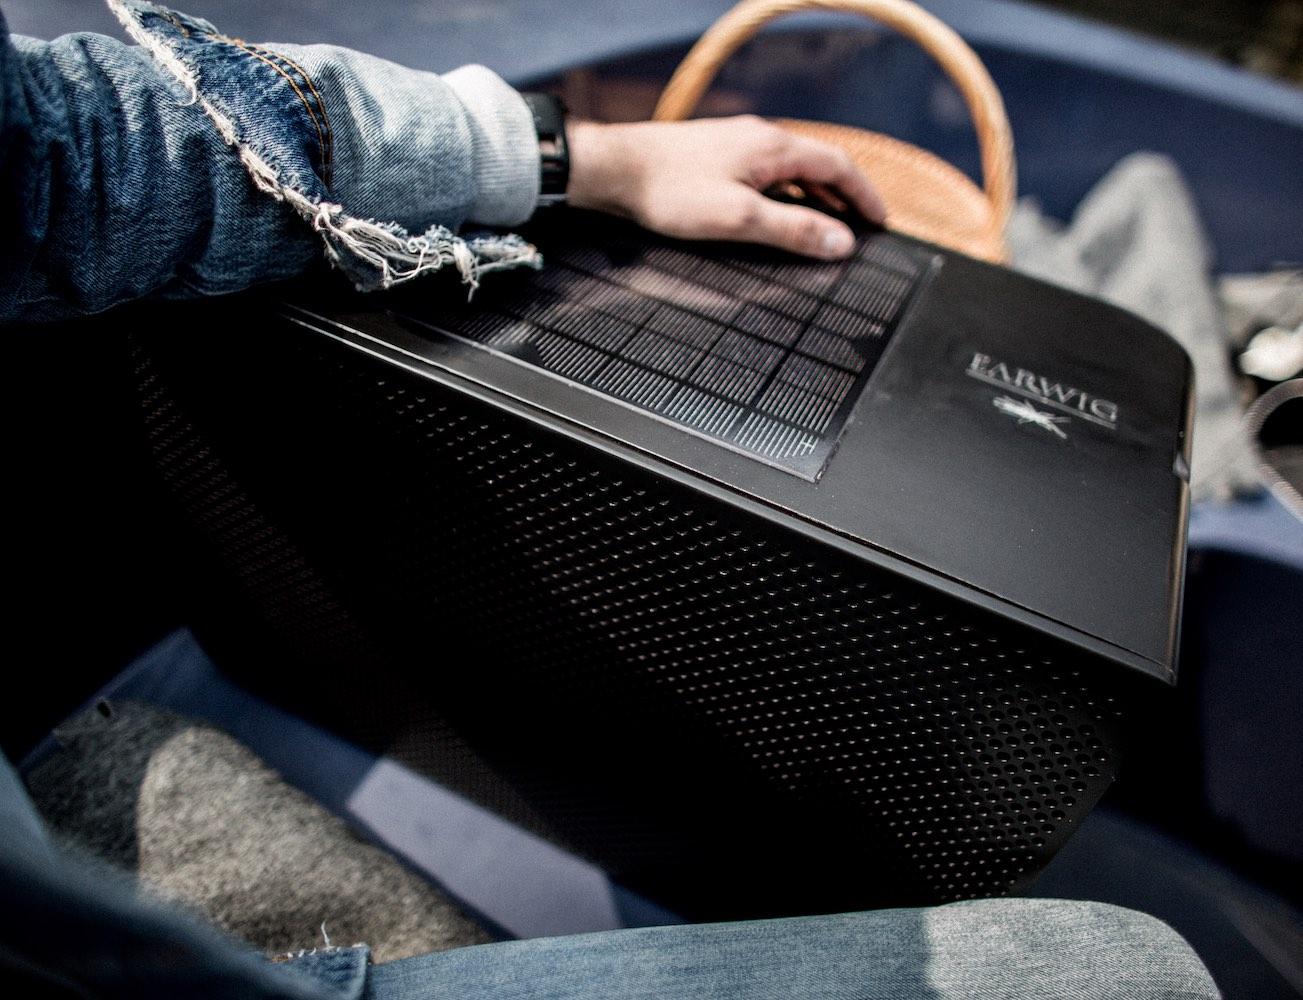 Earwig – The World's Most Powerful Solar Speaker